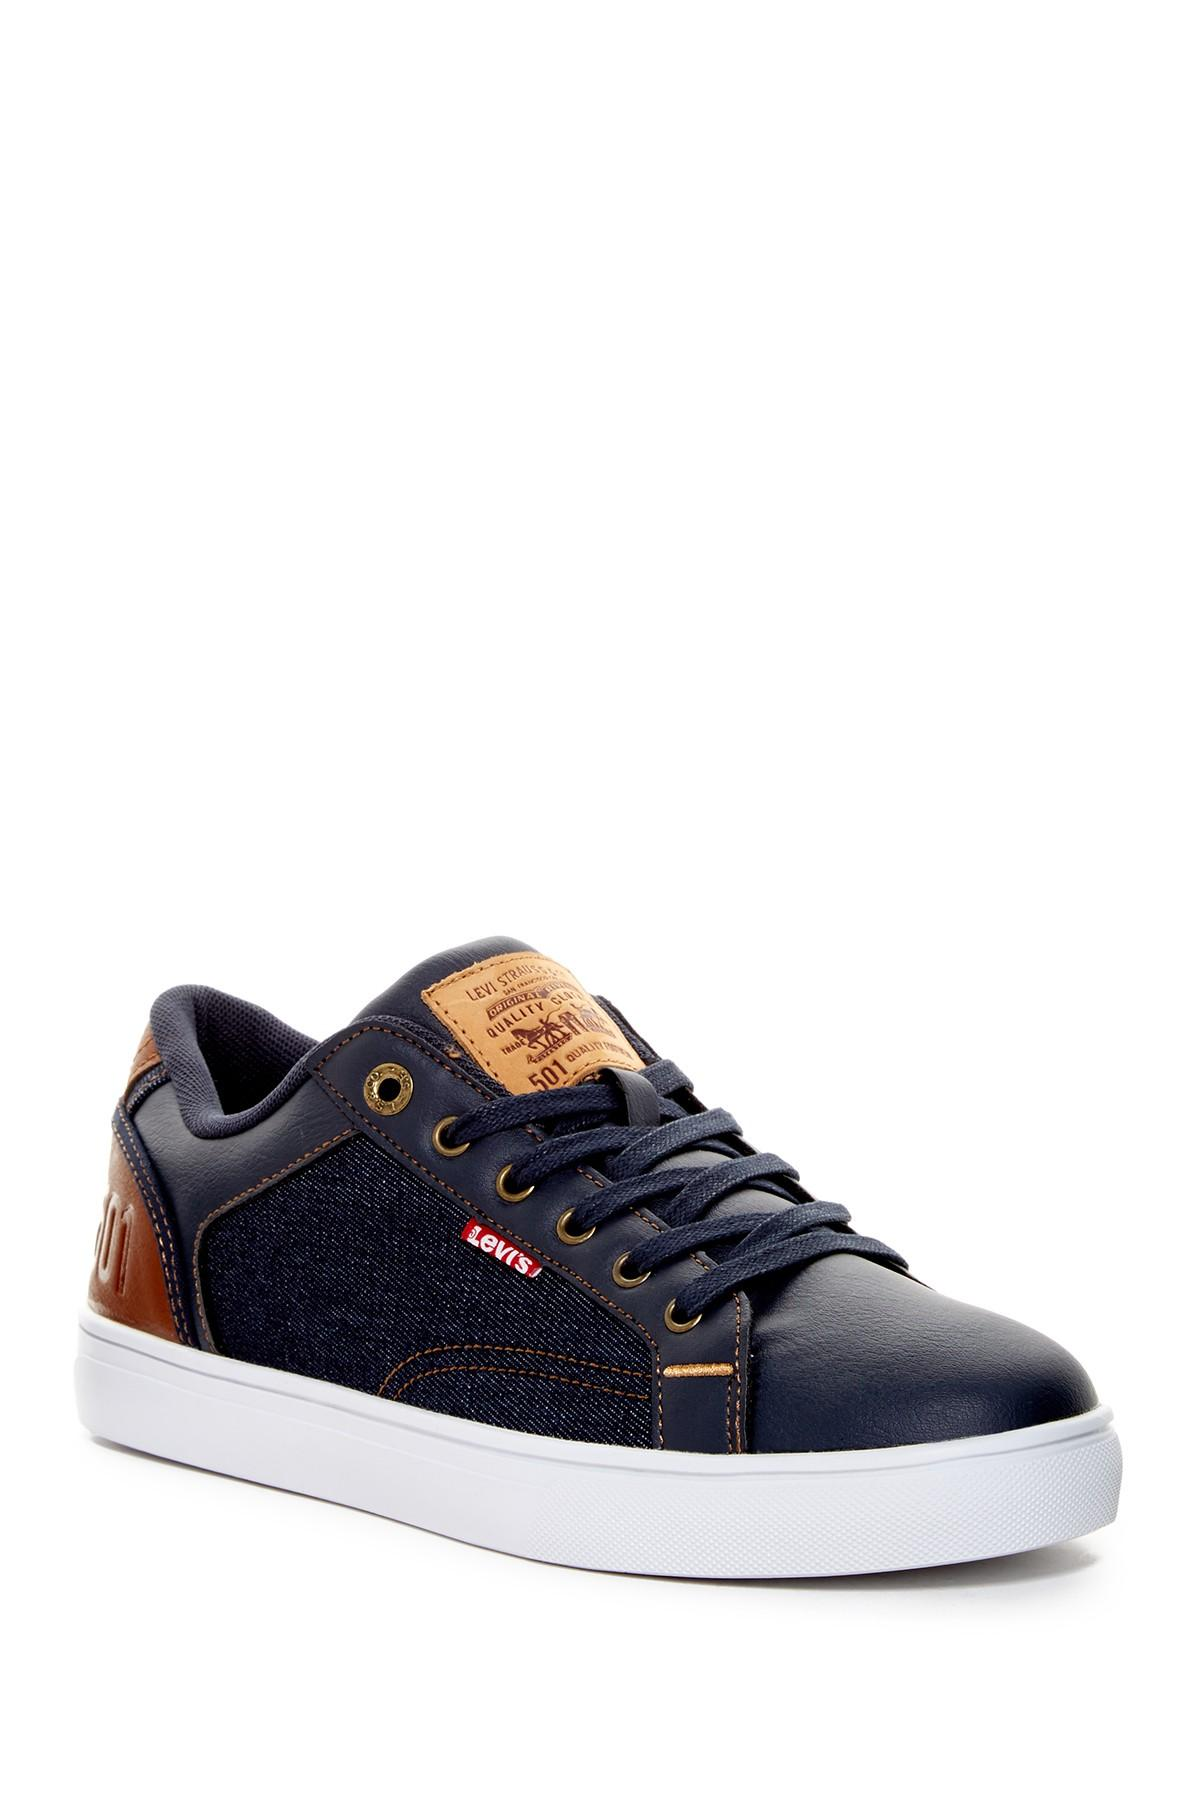 Jeffrey 501 Denim Sneaker in Navy-Tan